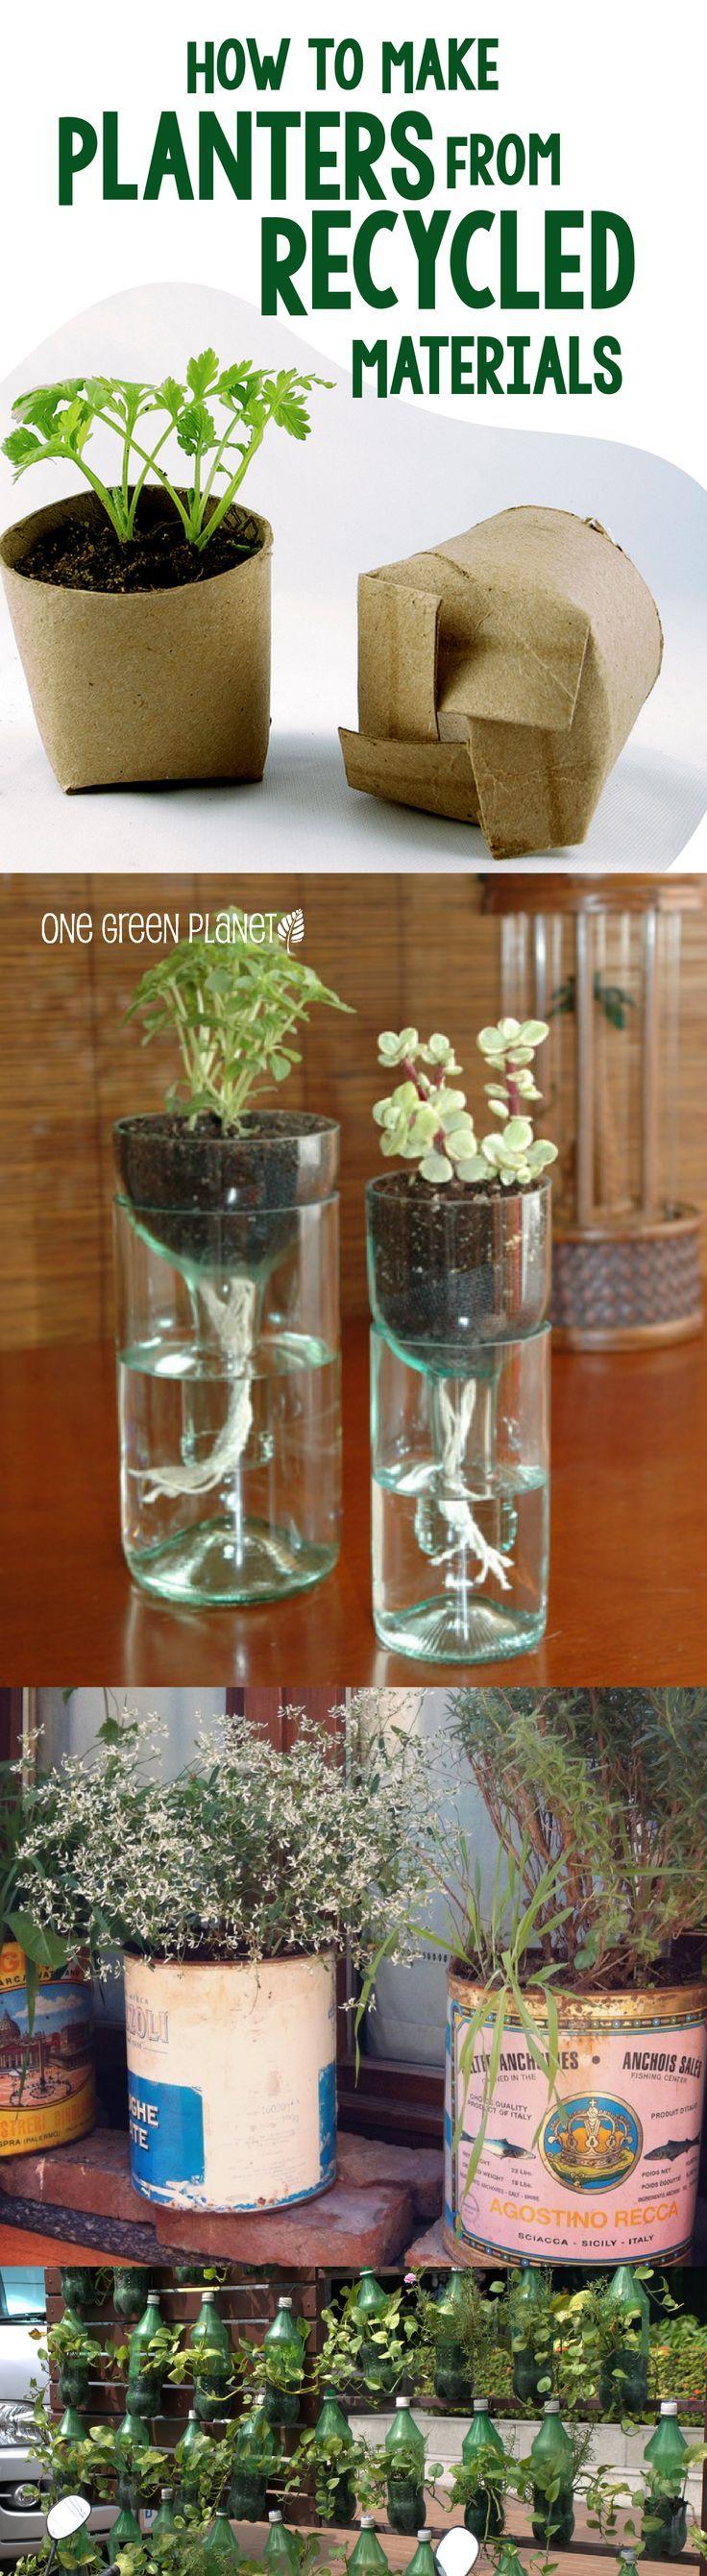 Recycled Garden Planters | Gardening n diy | Pinterest | Garden ...